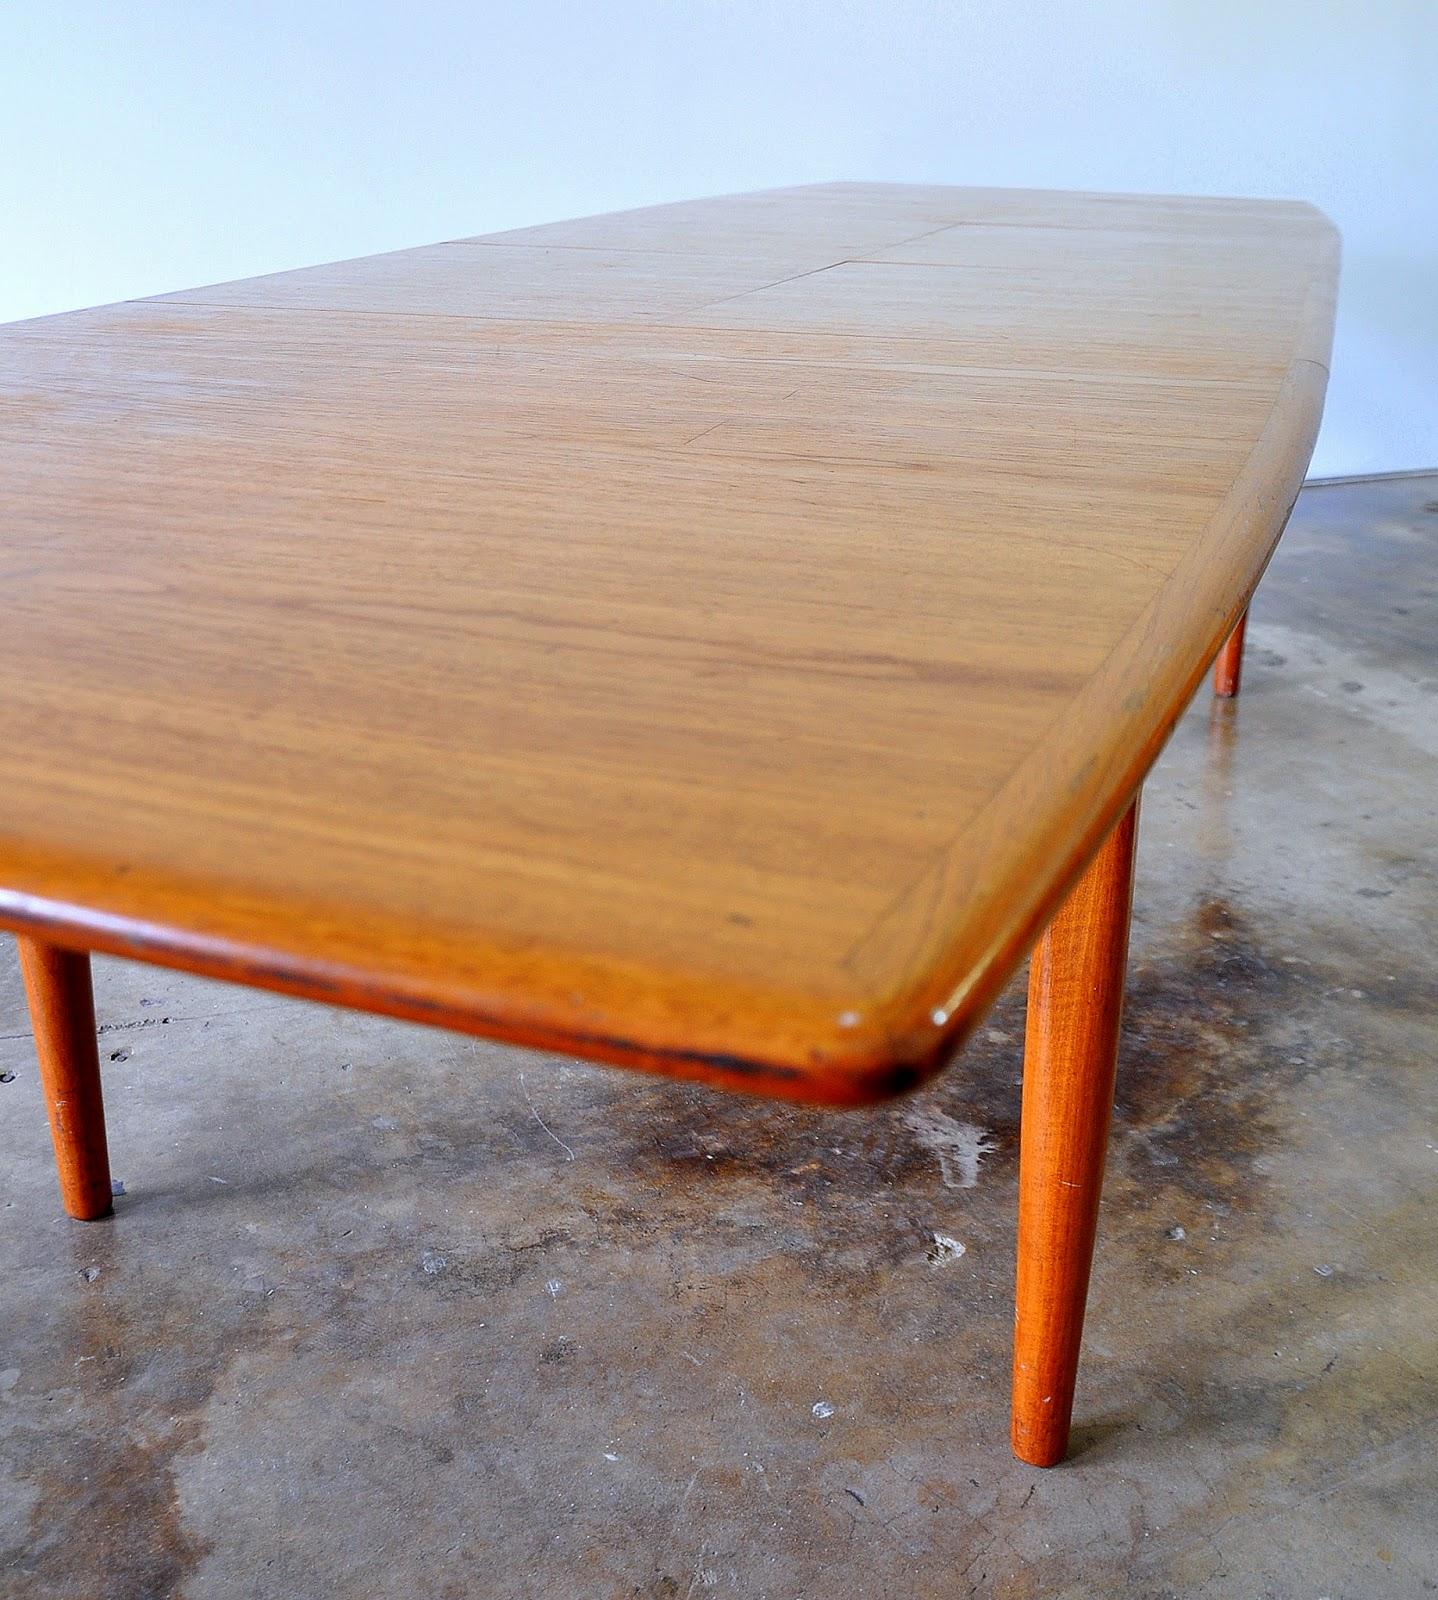 SELECT MODERN Falster Teak Expandable Dining Table : DanishModernFalsterTeakDiningTable19 from midcenturymoderndesignfinds.blogspot.com size 1438 x 1600 jpeg 468kB